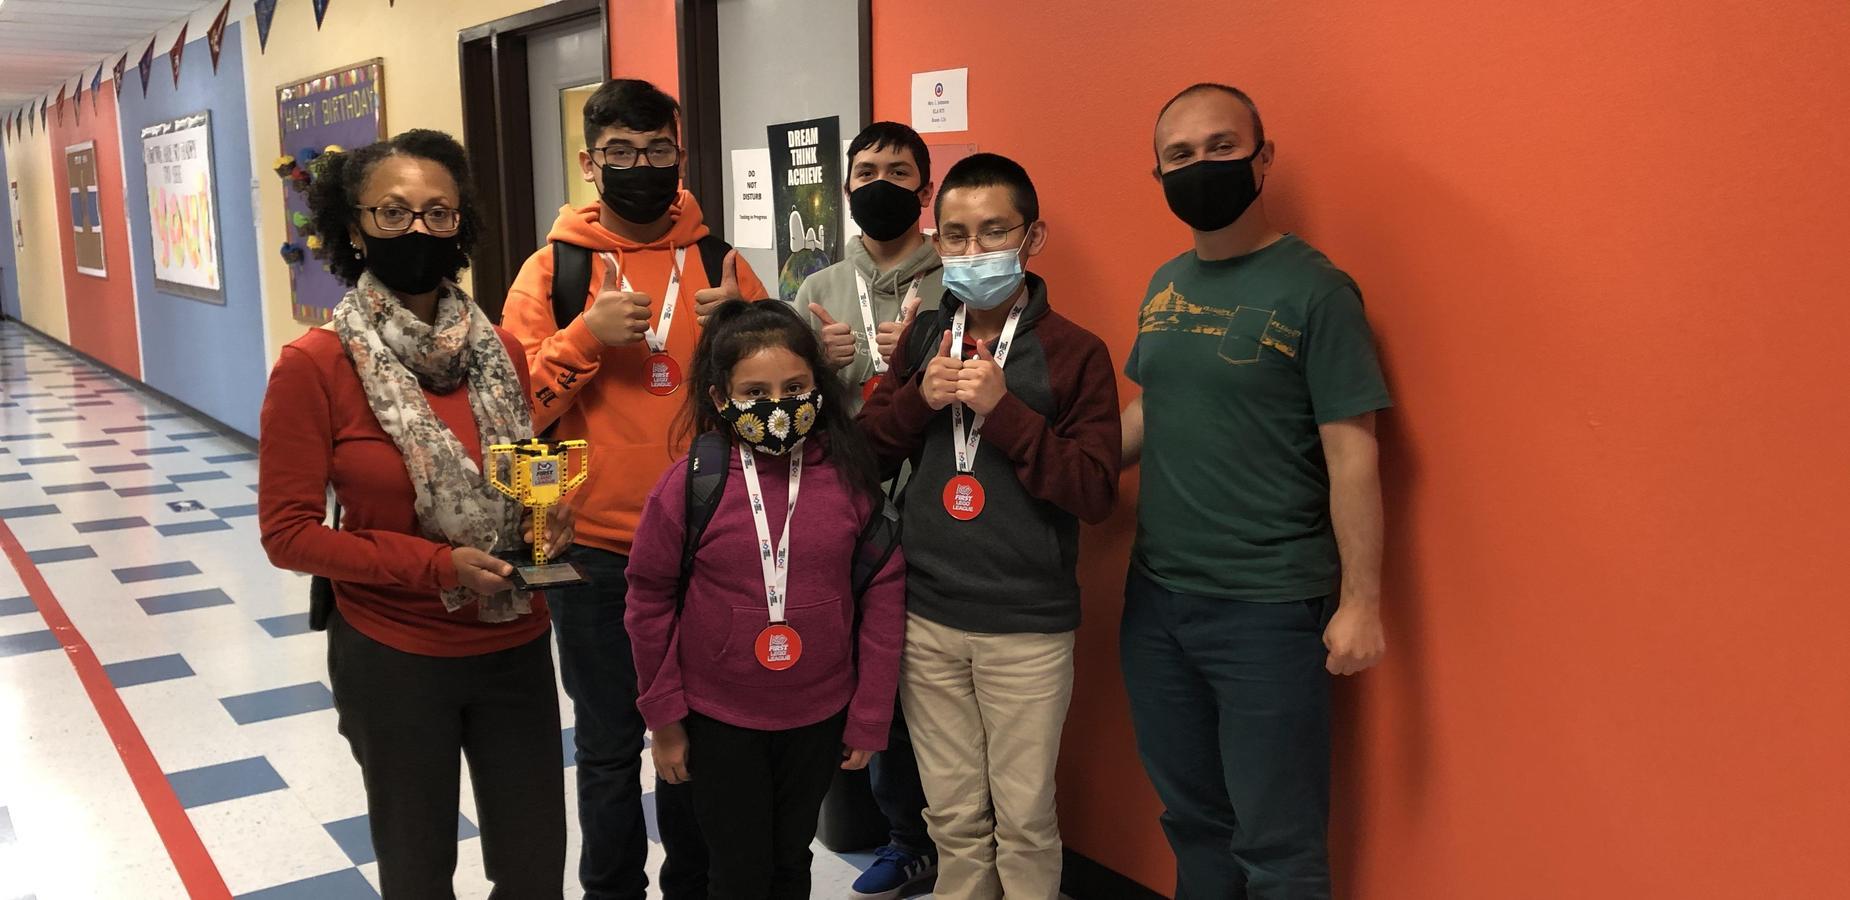 First Lego League Virtual Endurance Award